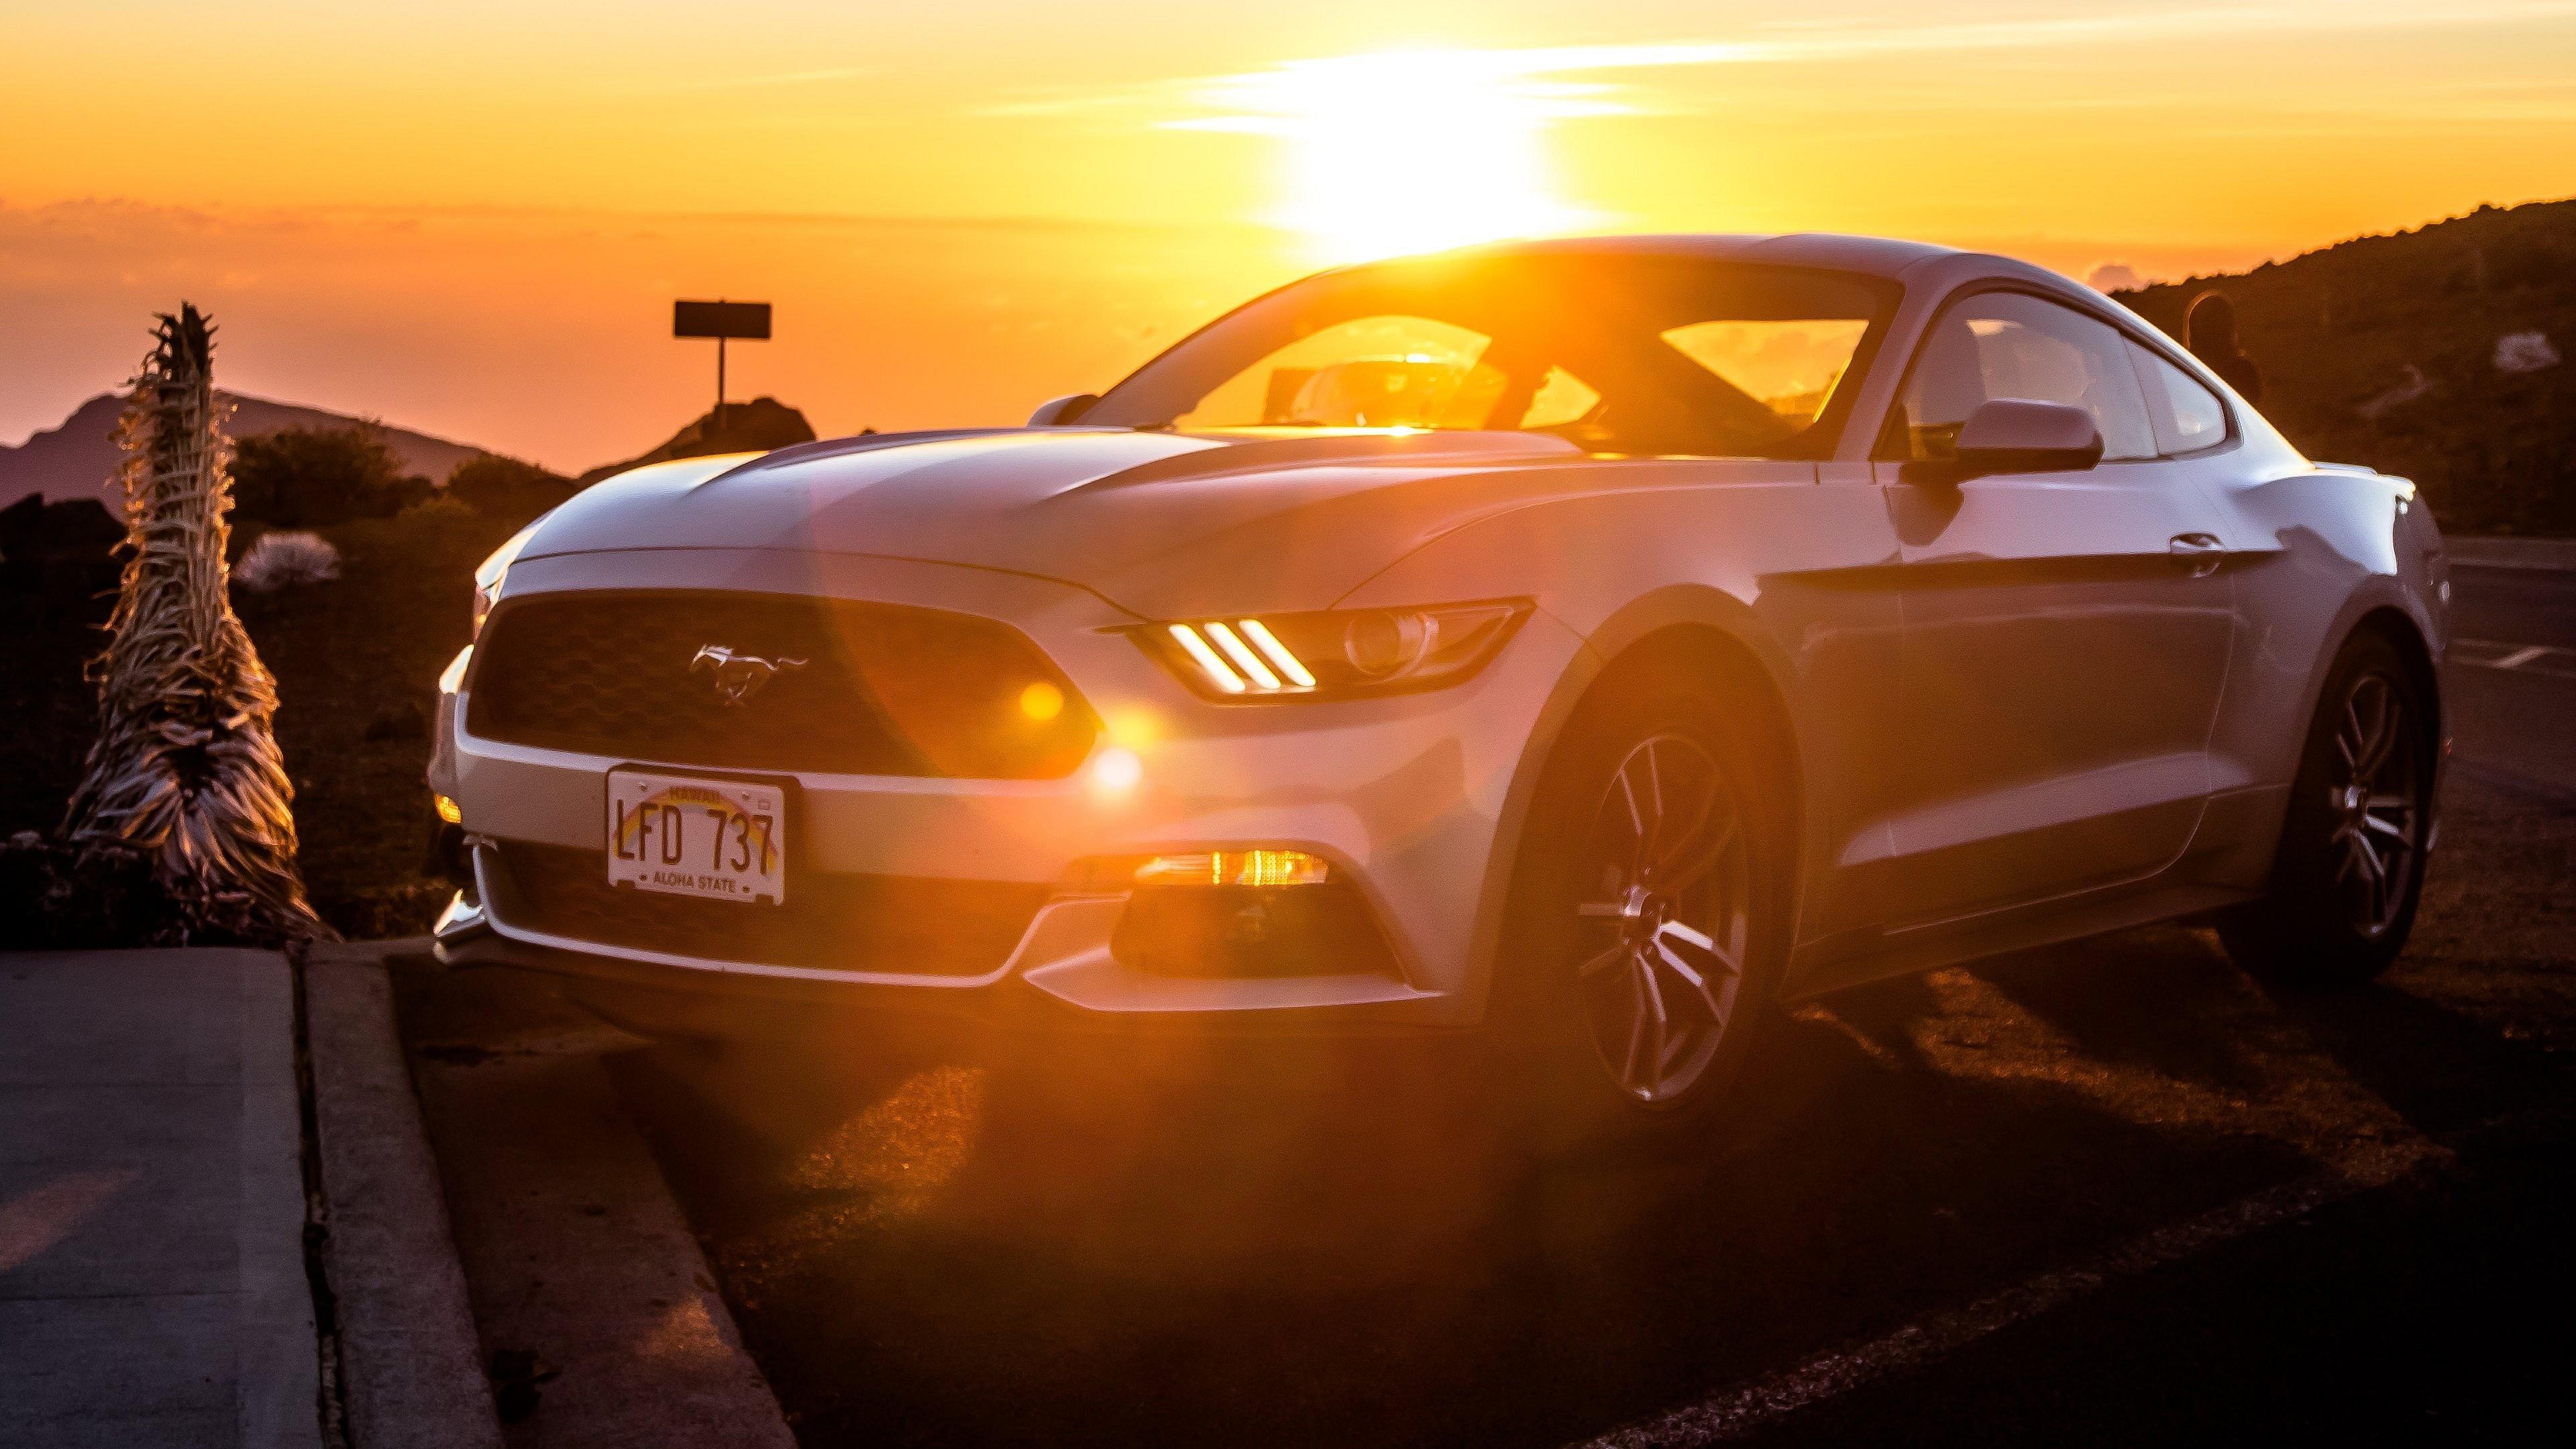 Res: 3840x2160, Furt Mustang Hd Wallpapers 4k Hintergrundbild Ipad